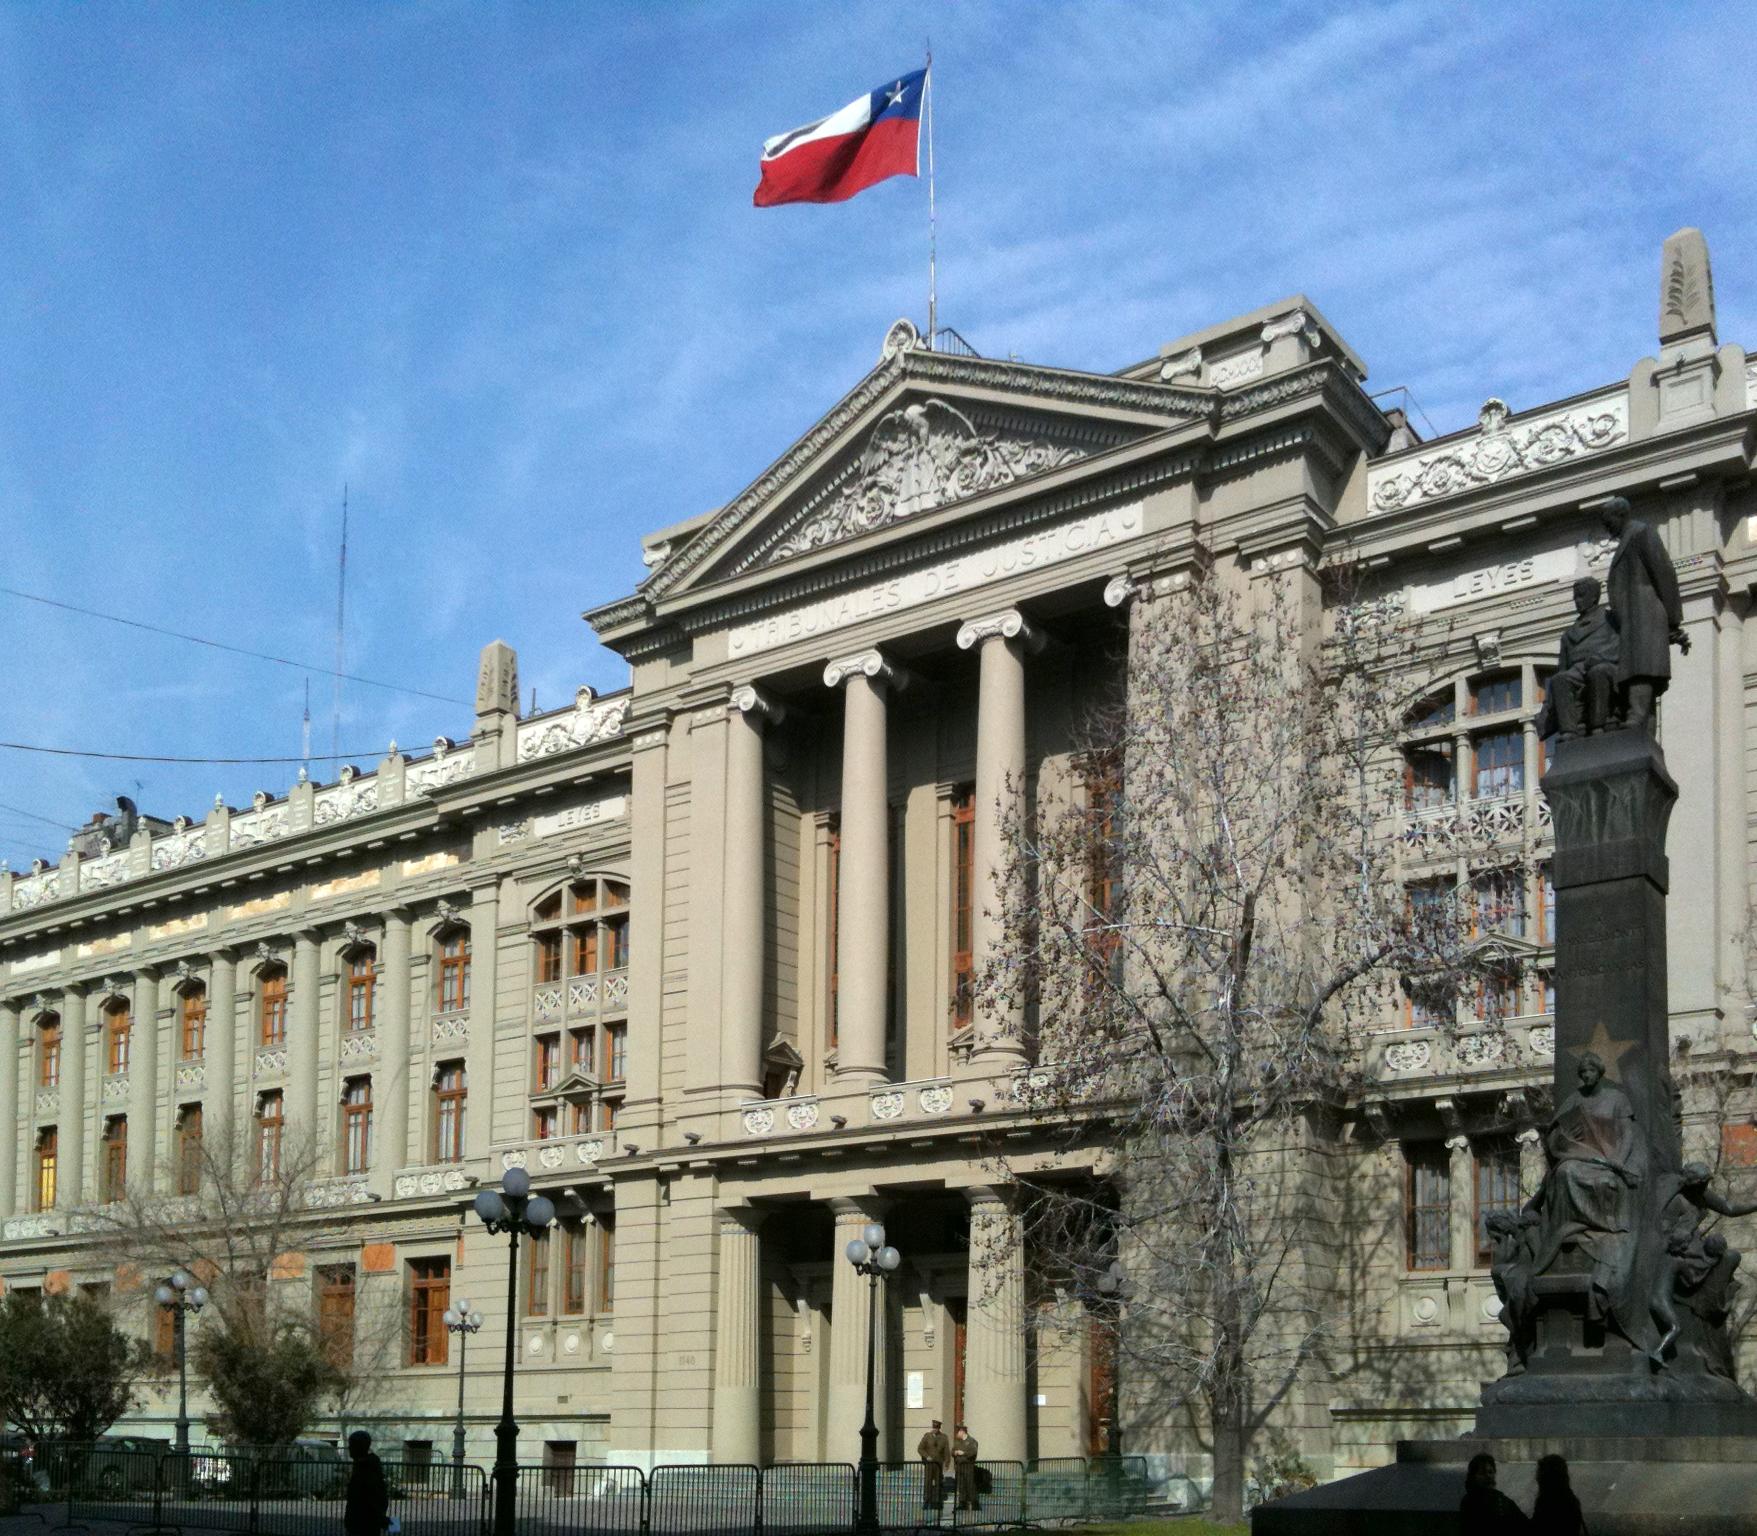 Depiction of Poder Judicial de Chile